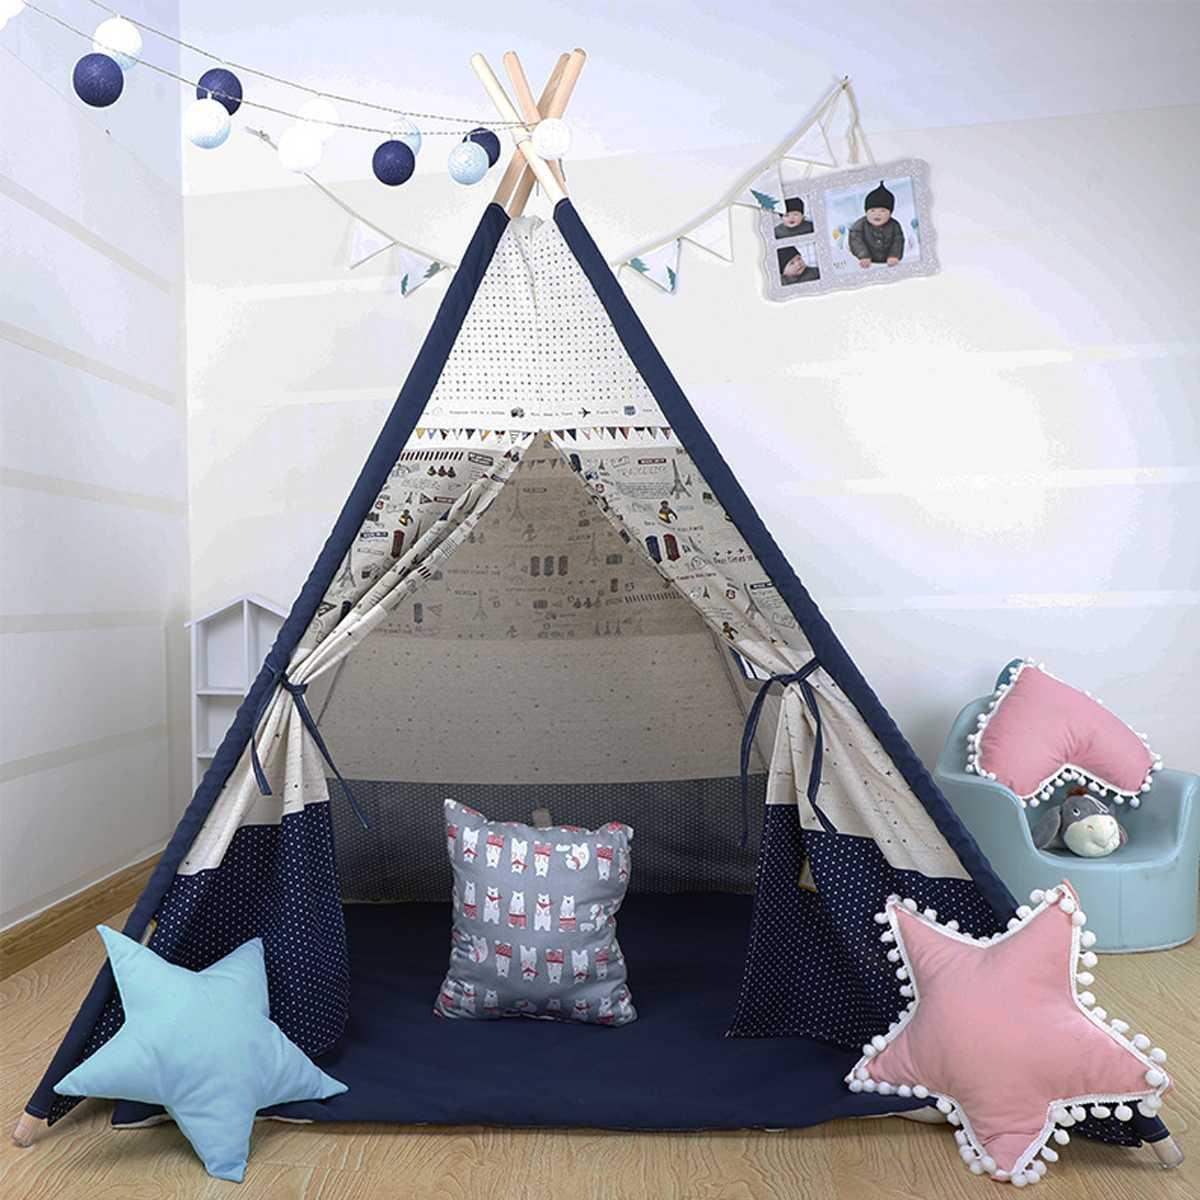 1200x1200x1600mm Große Tipi Zelt Kinder Leinwand Home Pretend Play Outdoor  Indoor Kind Weihnachtsgeschenke